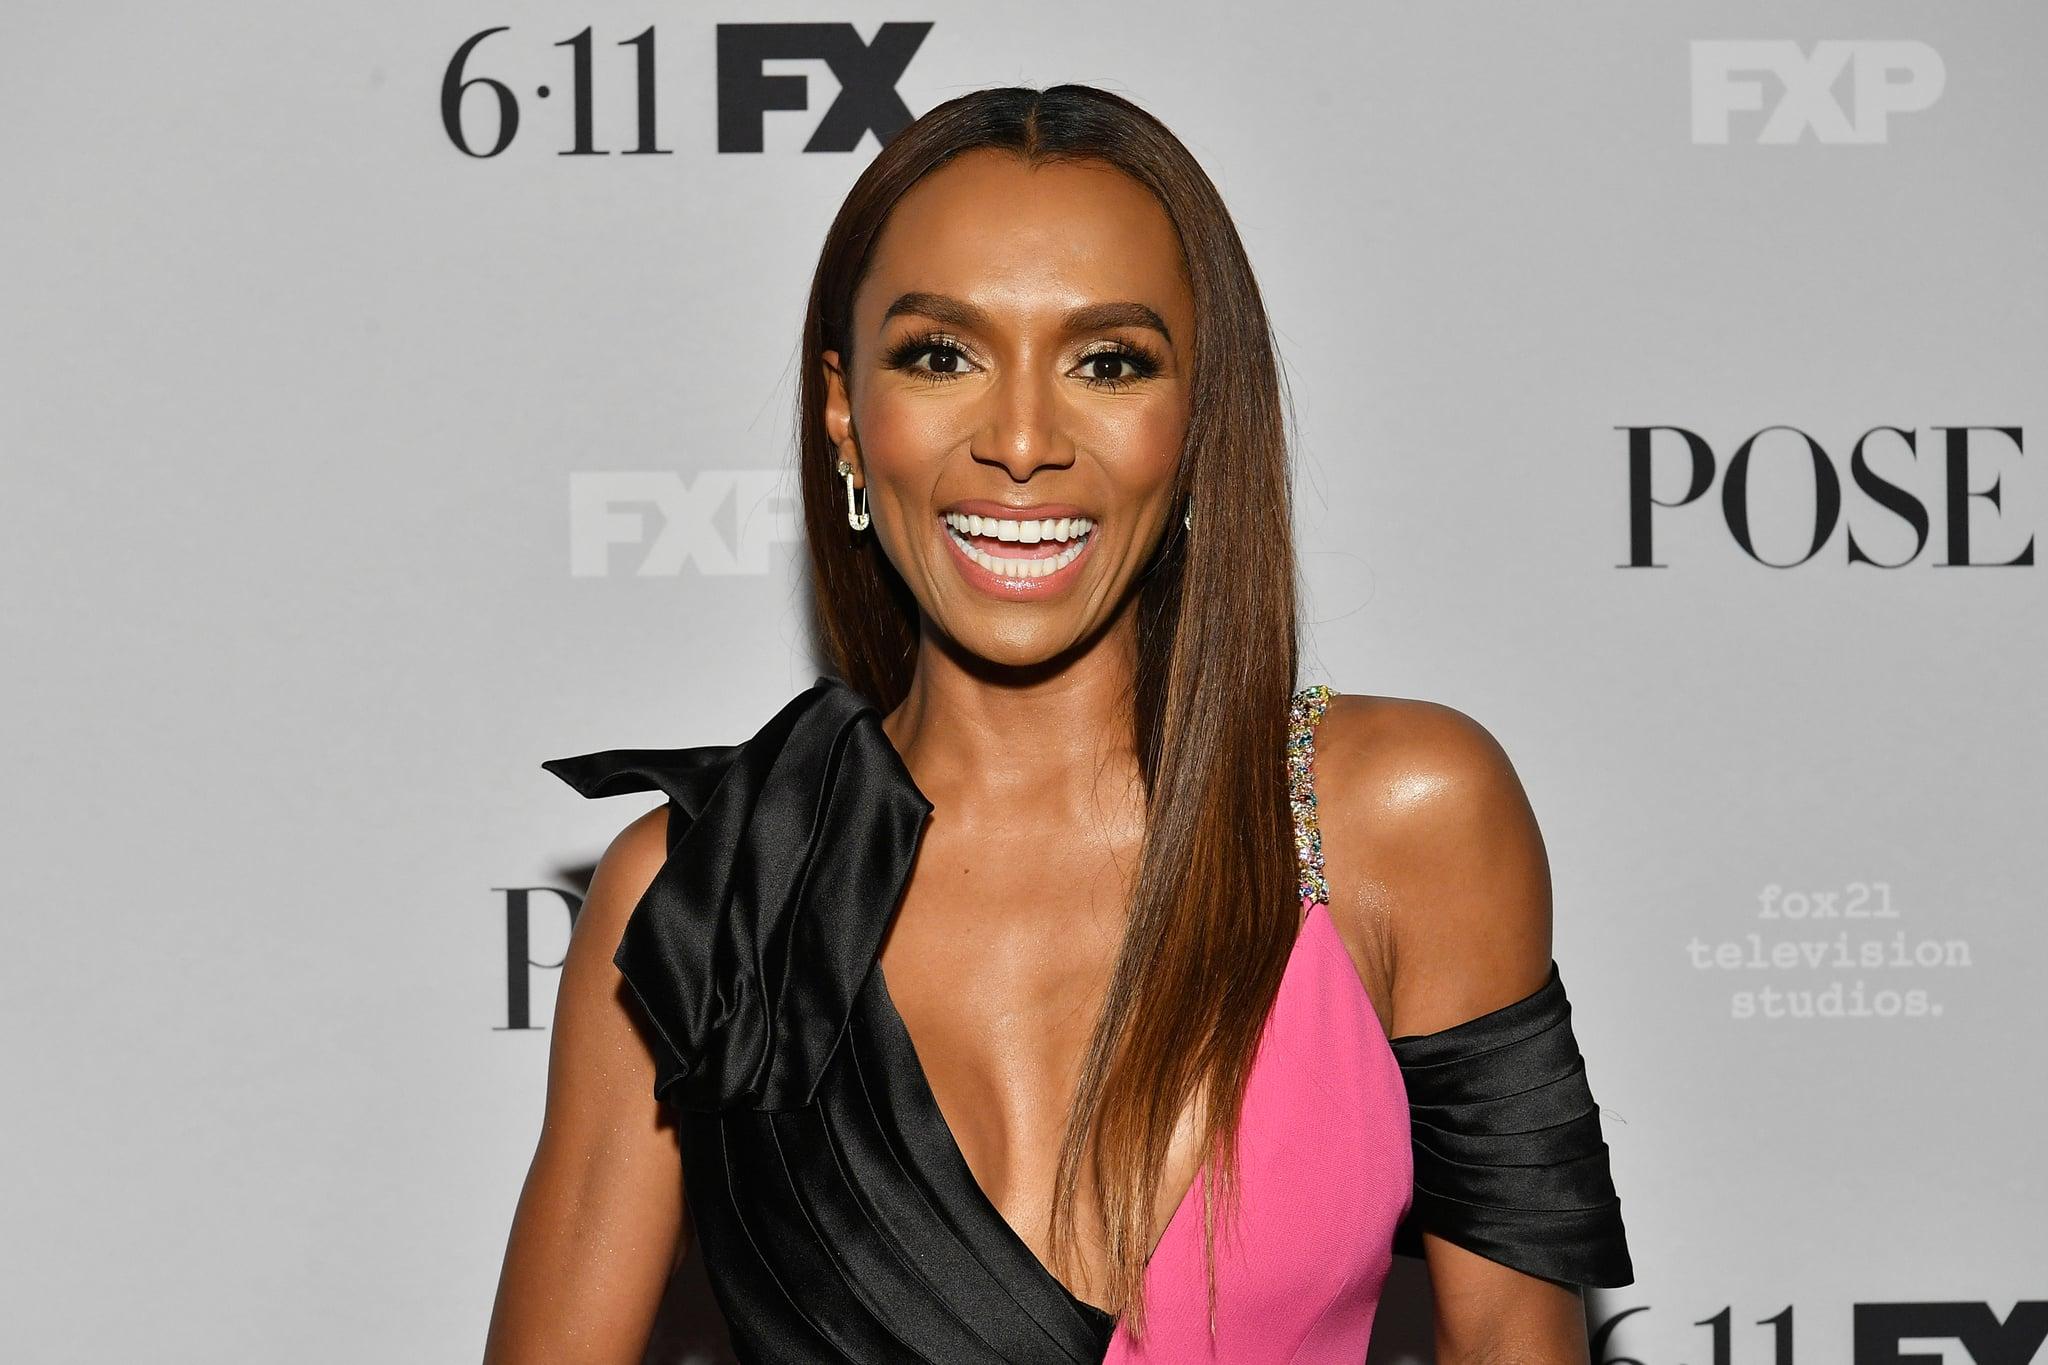 NEW YORK, NEW YORK - JUNE 05: Janet Mock attends FX Network's